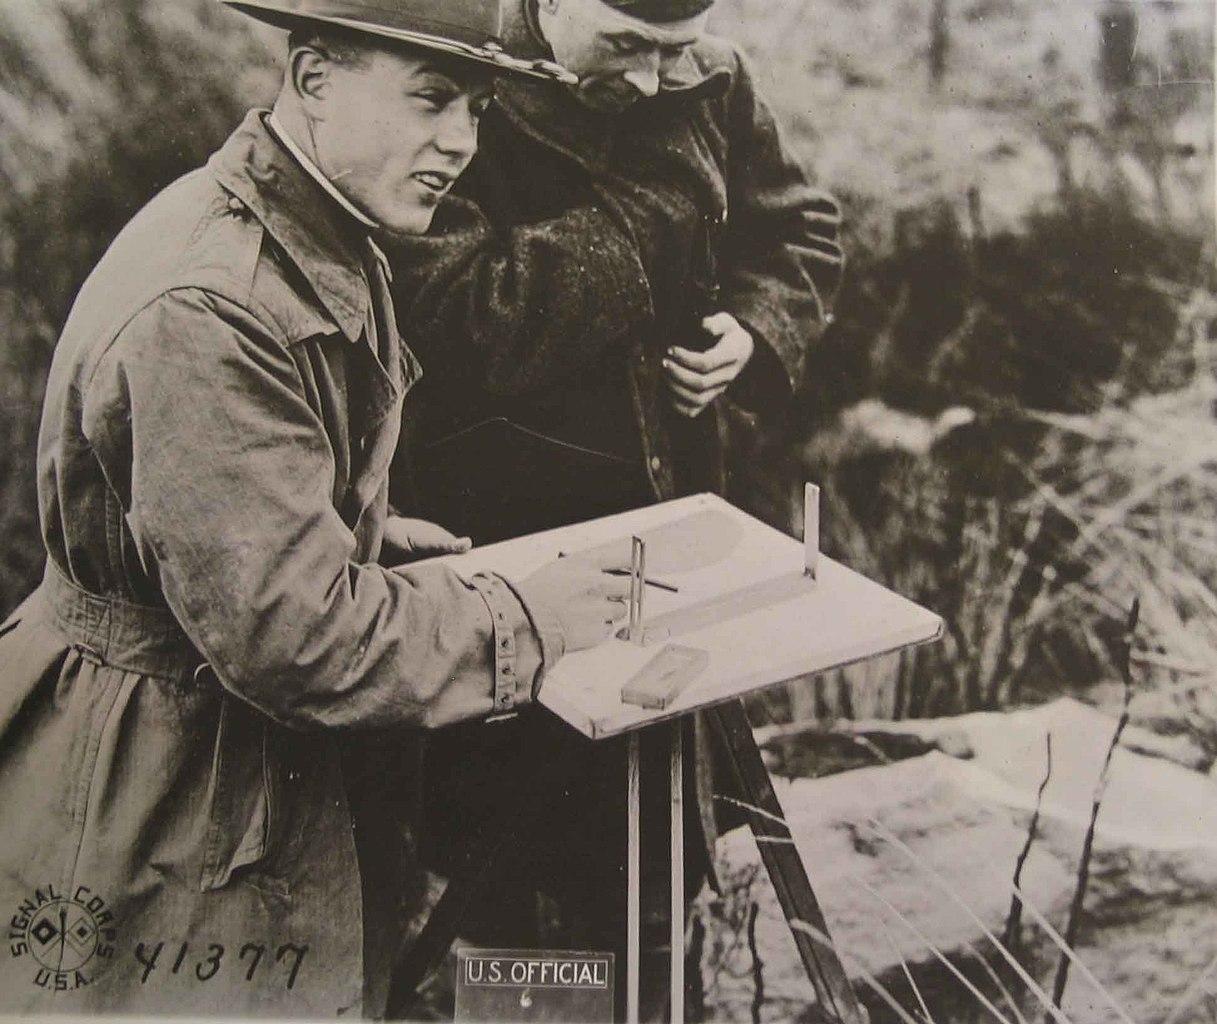 FileUS Army Corps Of Engineers Map Making World War Ijpg - Us corps of engineers maps